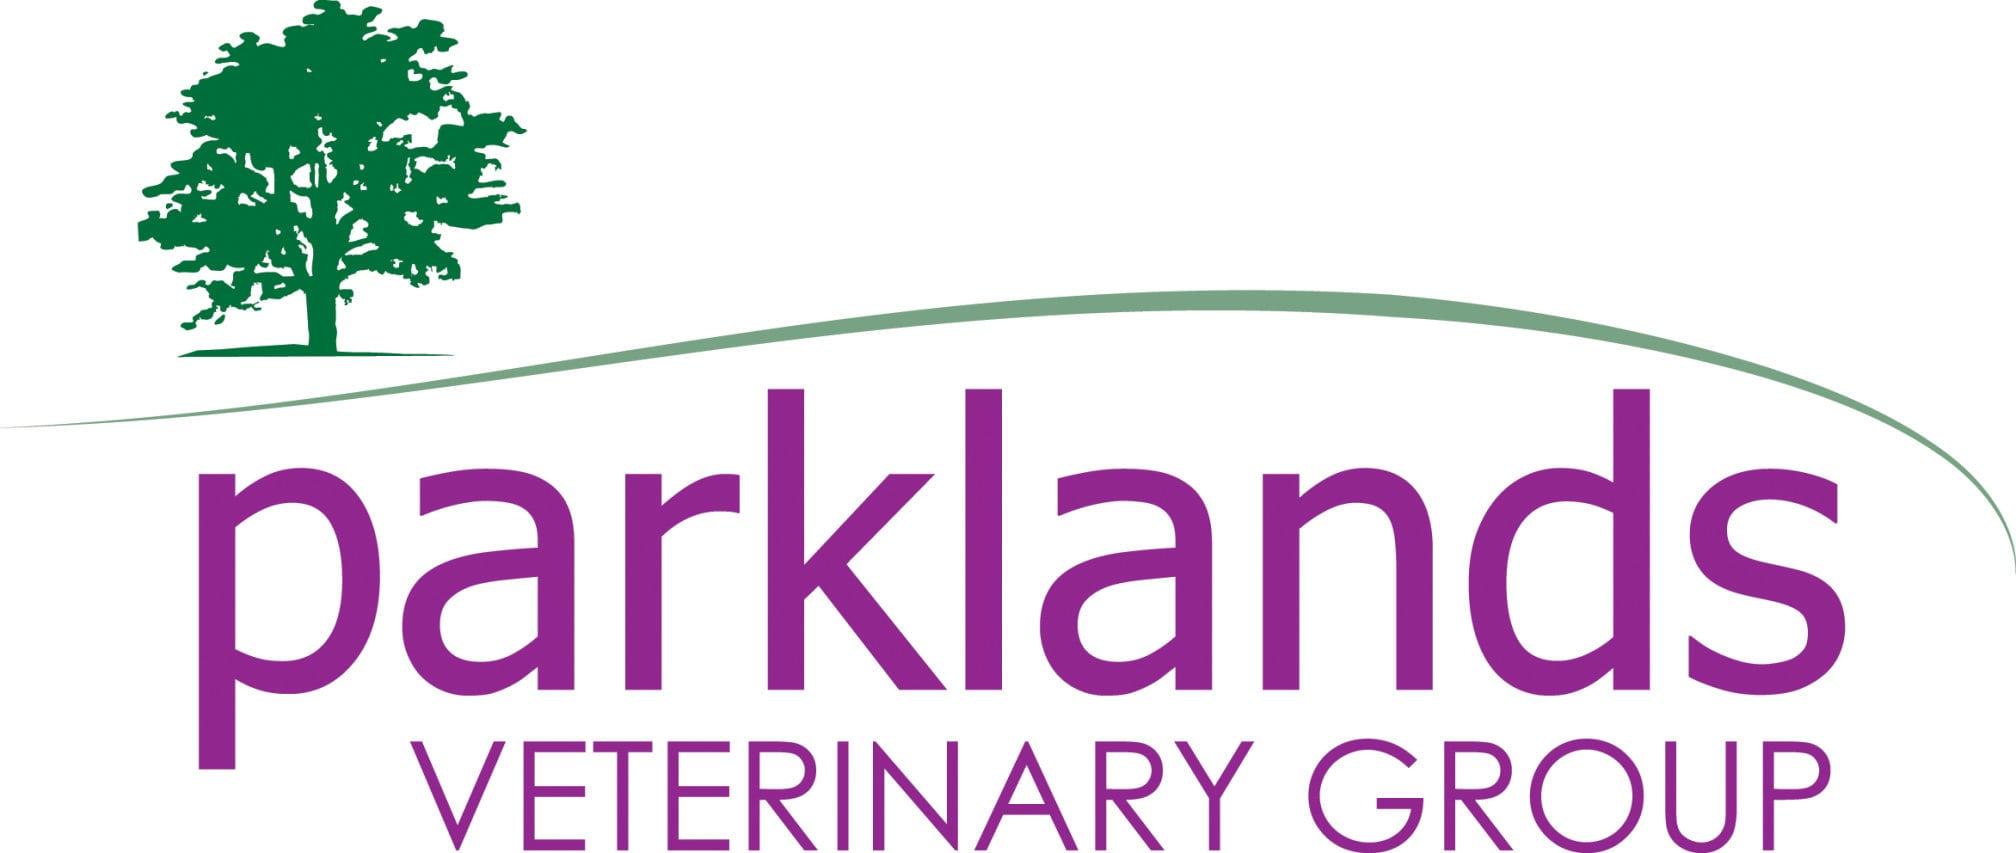 Parklands Veterinary Clinic | 2 Caledon Road, Aughnacloy BT69 6AL | +44 28 8555 7811